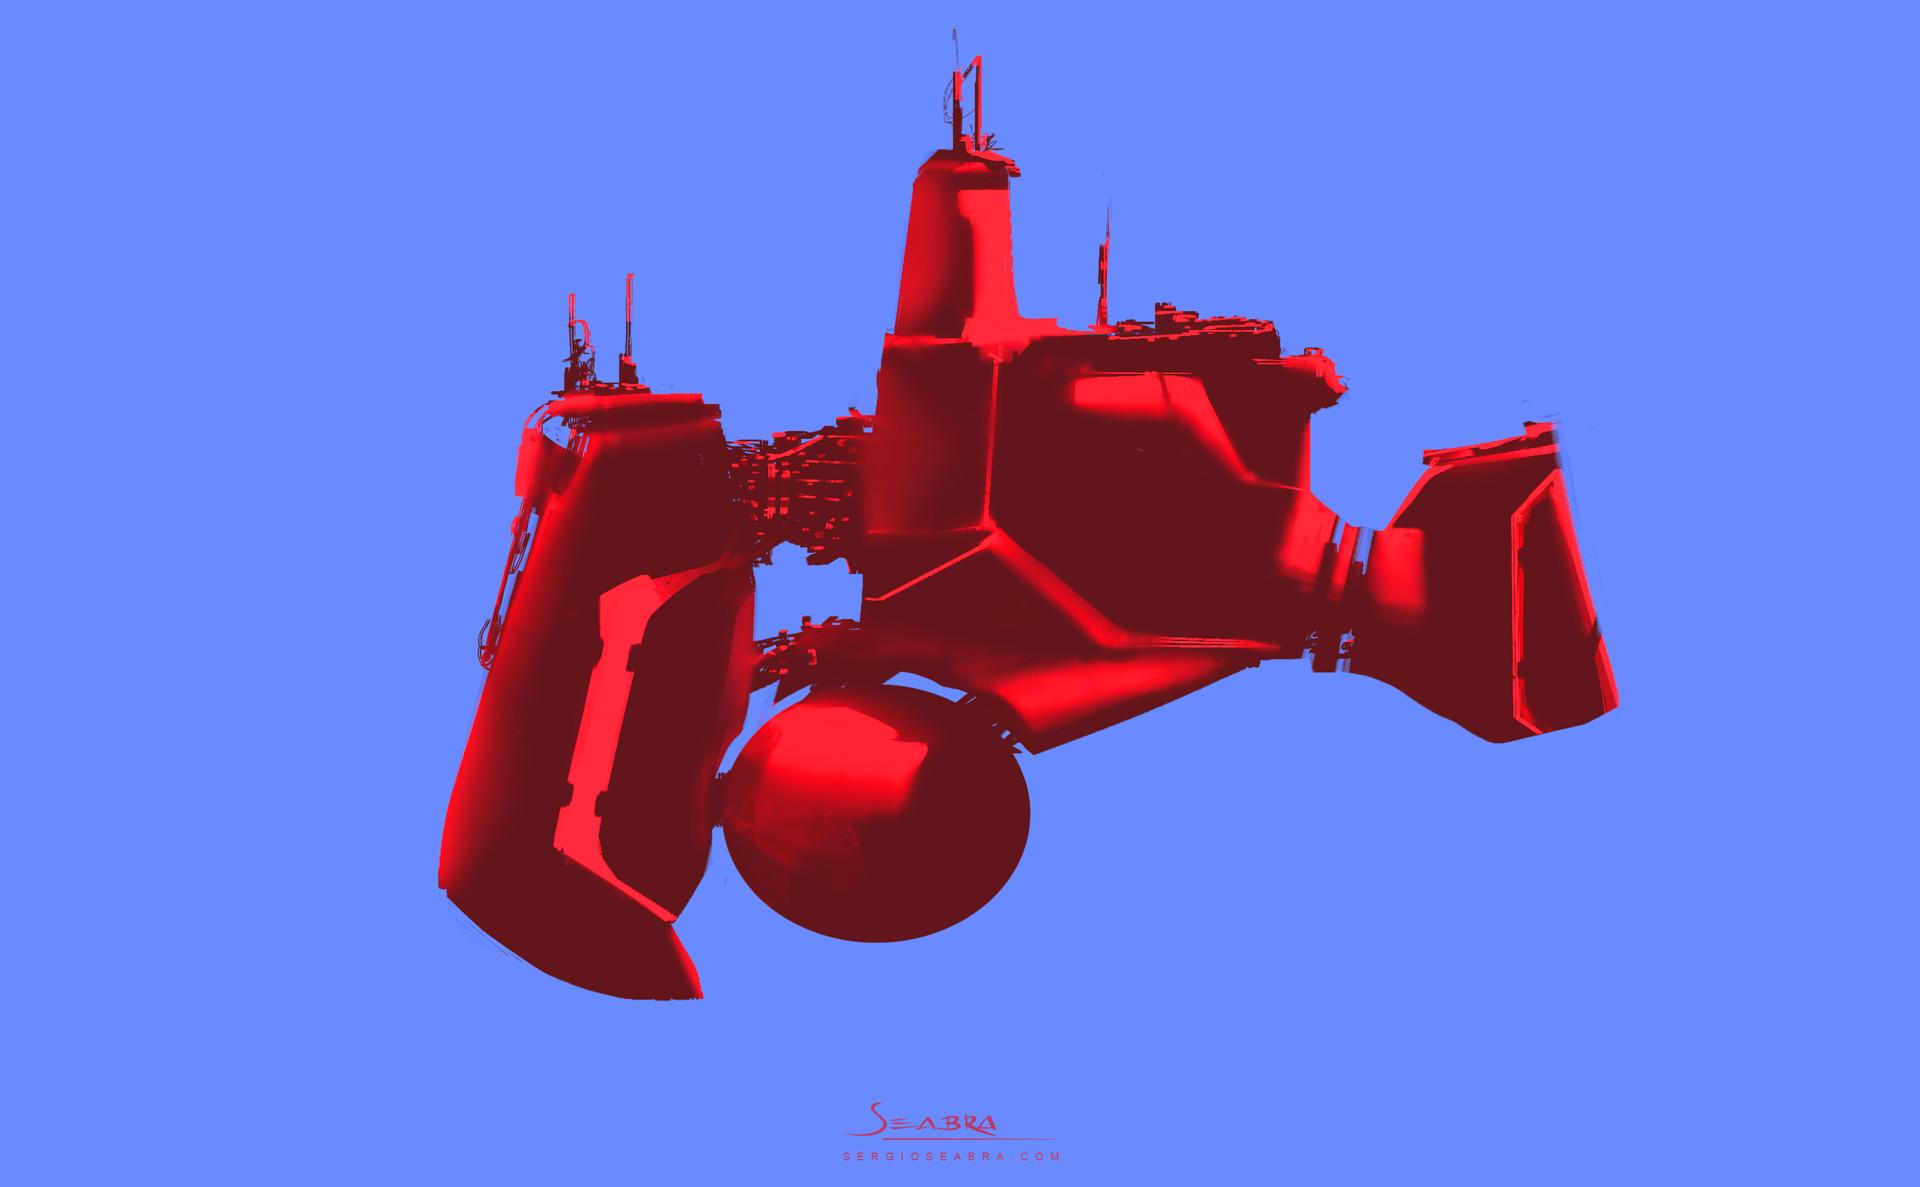 Sergio seabra 2016 spaceship expl ss1